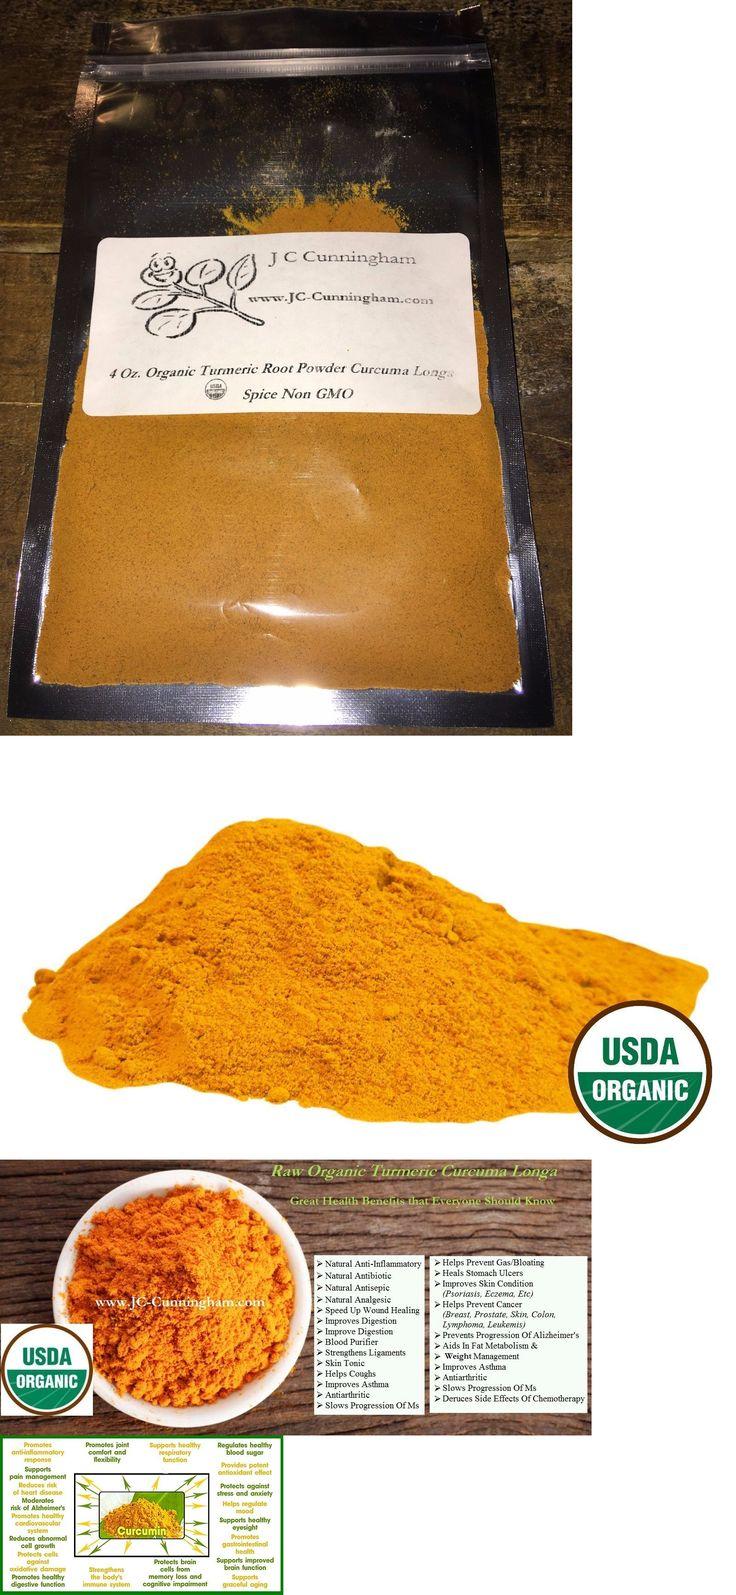 Herbs and Botanicals: Organic Herbs Turmeric Root Curcuma Longa Extract Powder Curcumin 95% Non Gmo -> BUY IT NOW ONLY: $39.17 on eBay!